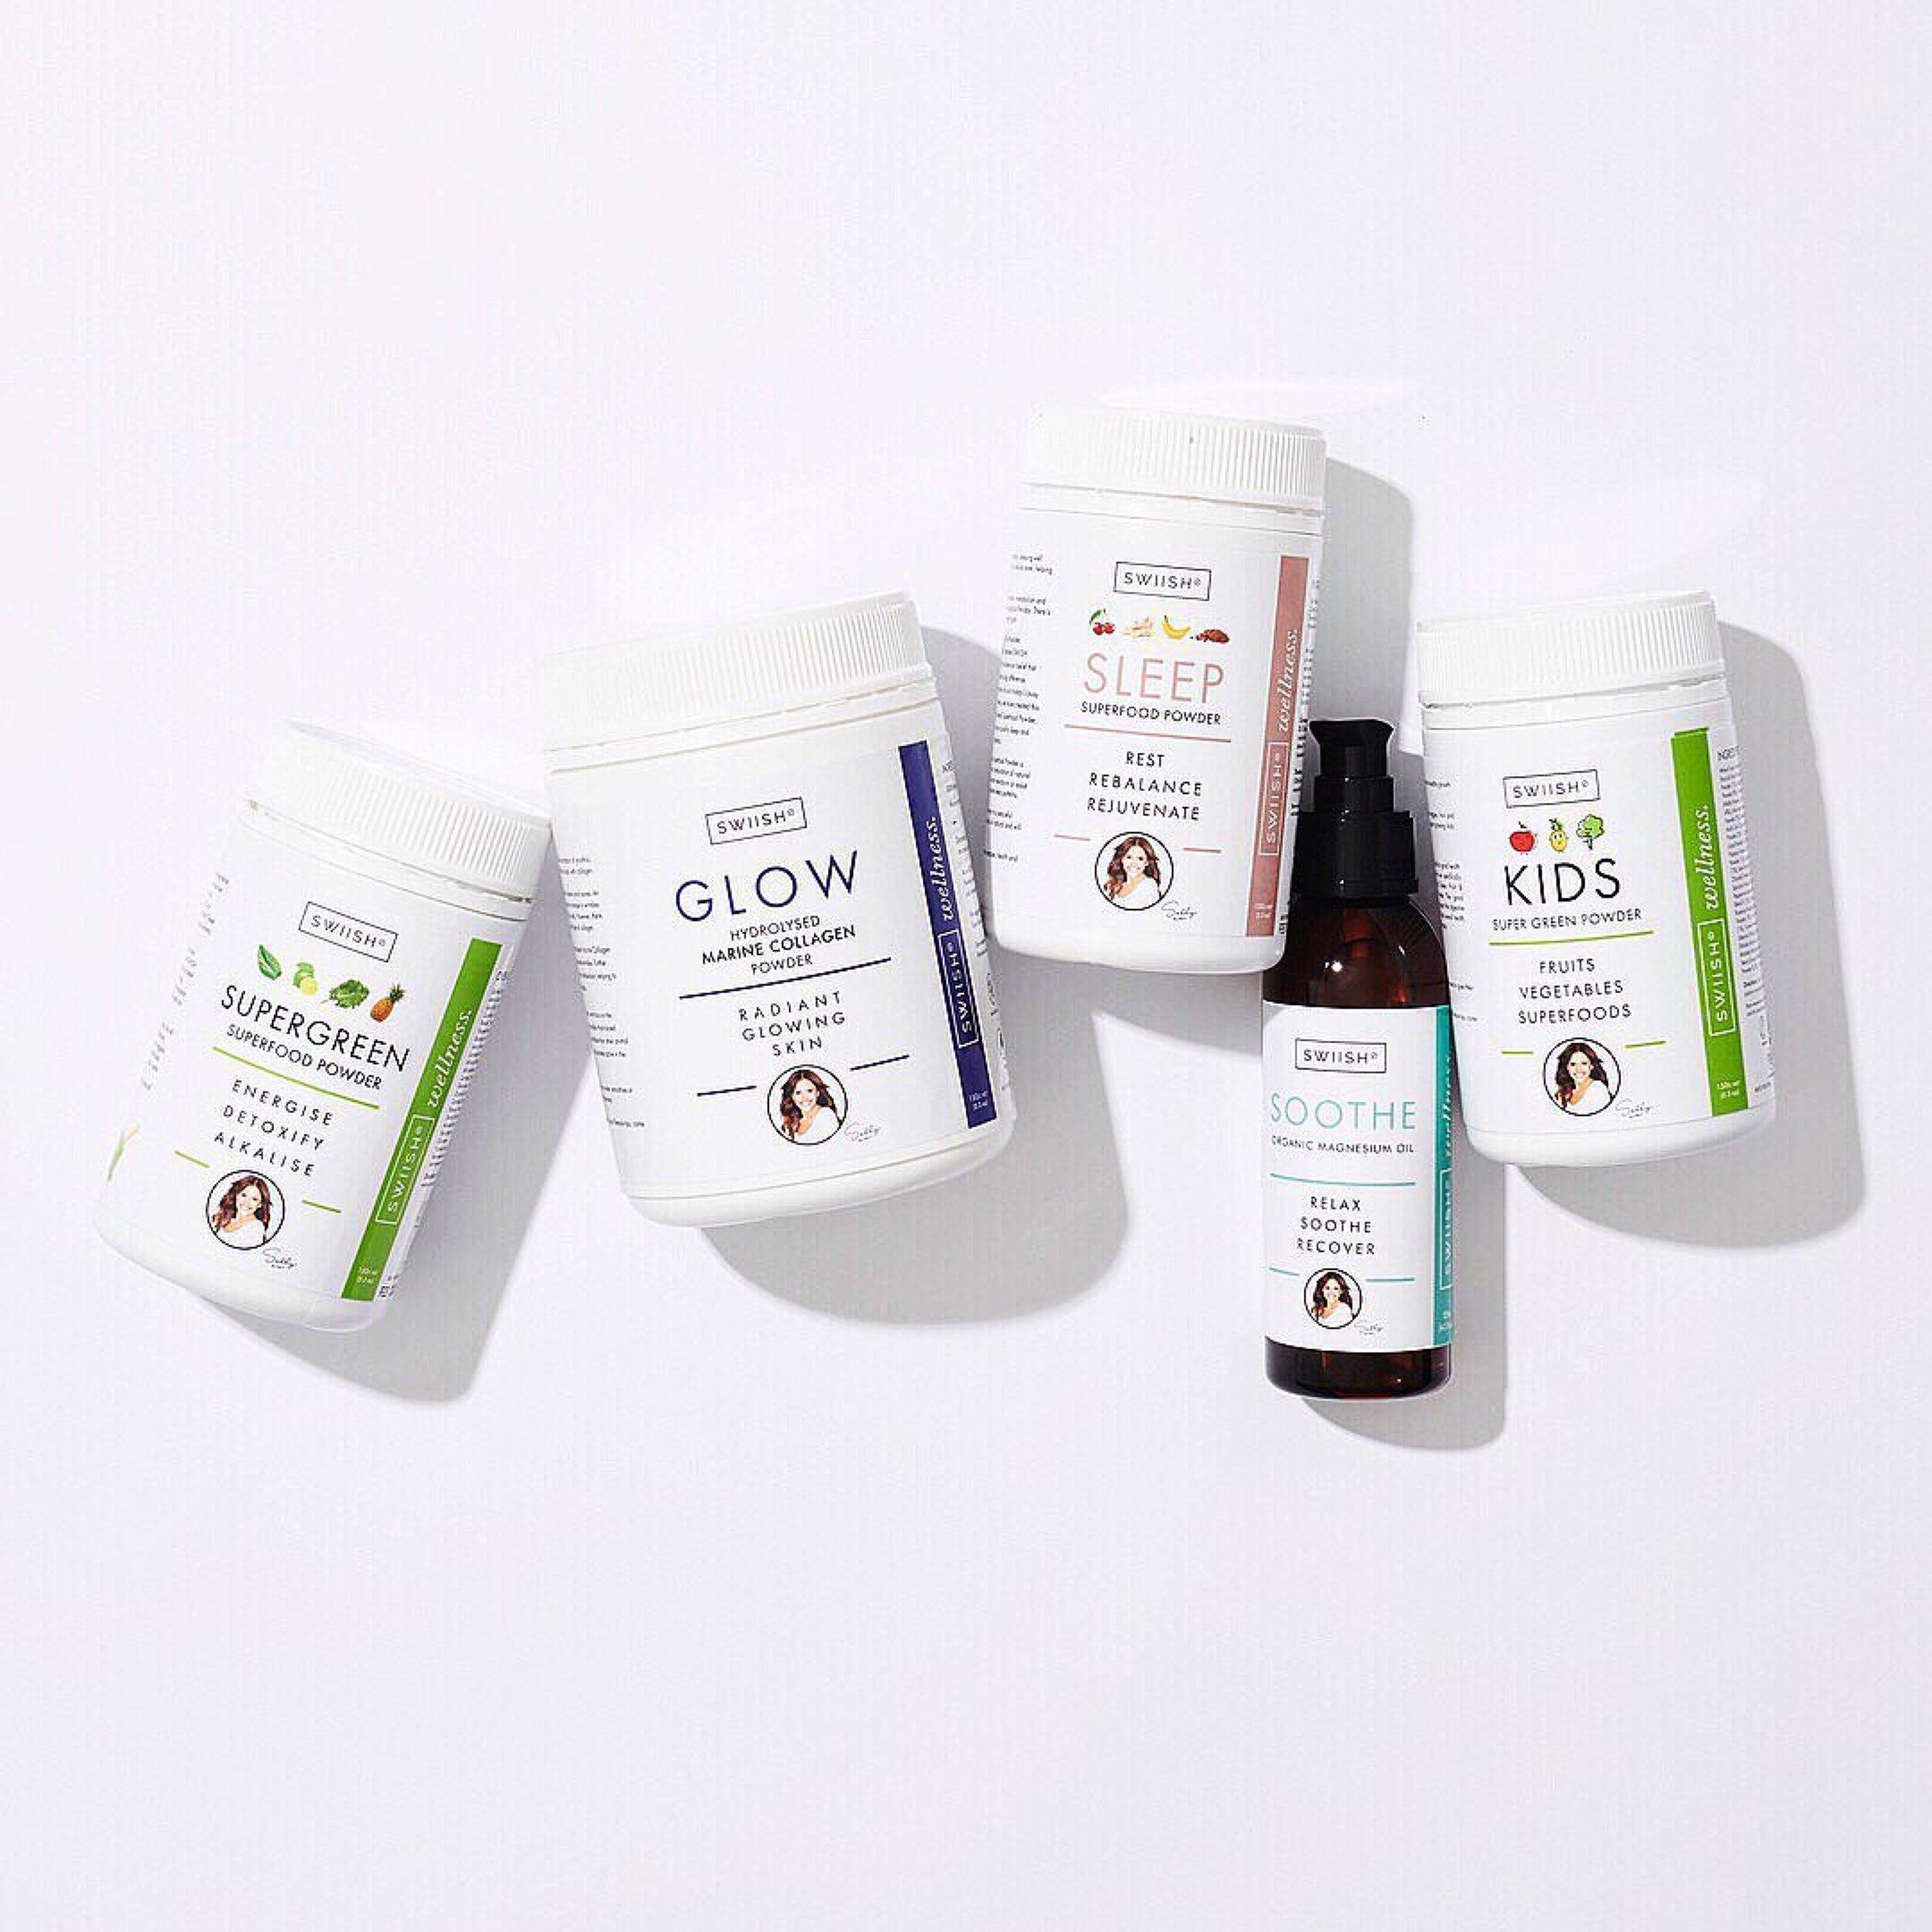 Swiish Sally Obermeder Packaging Design